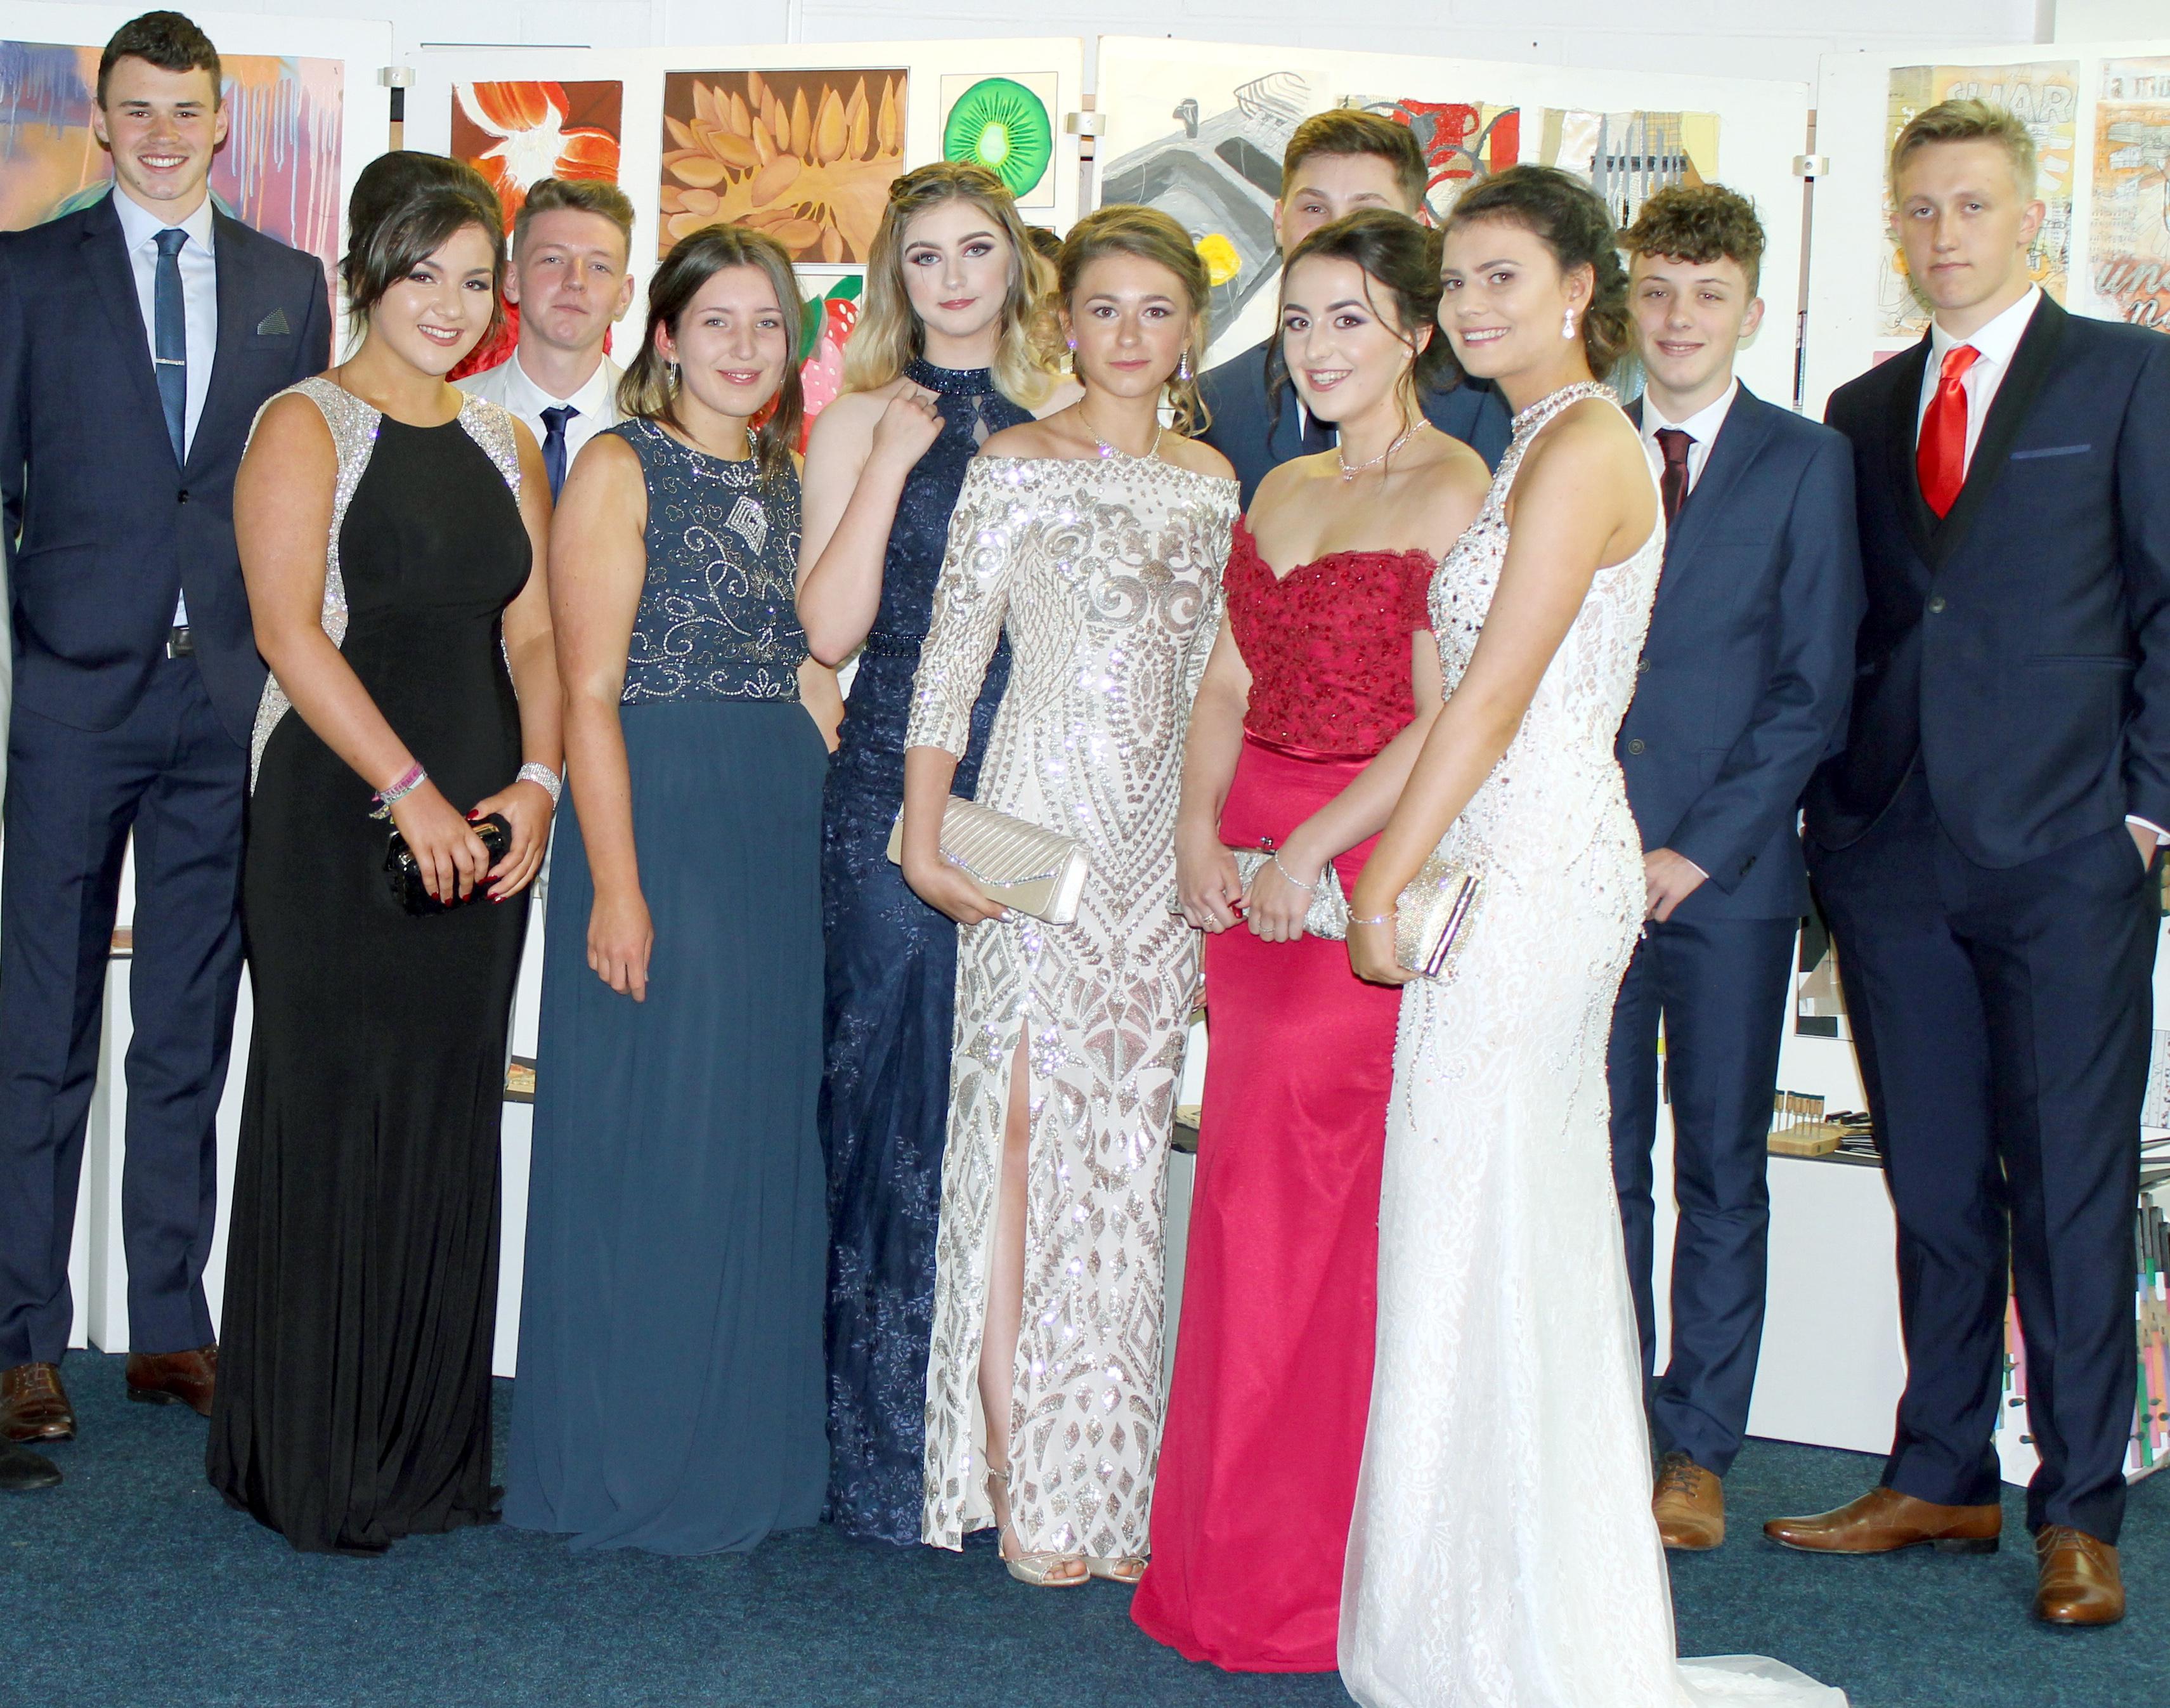 JCSC prom group